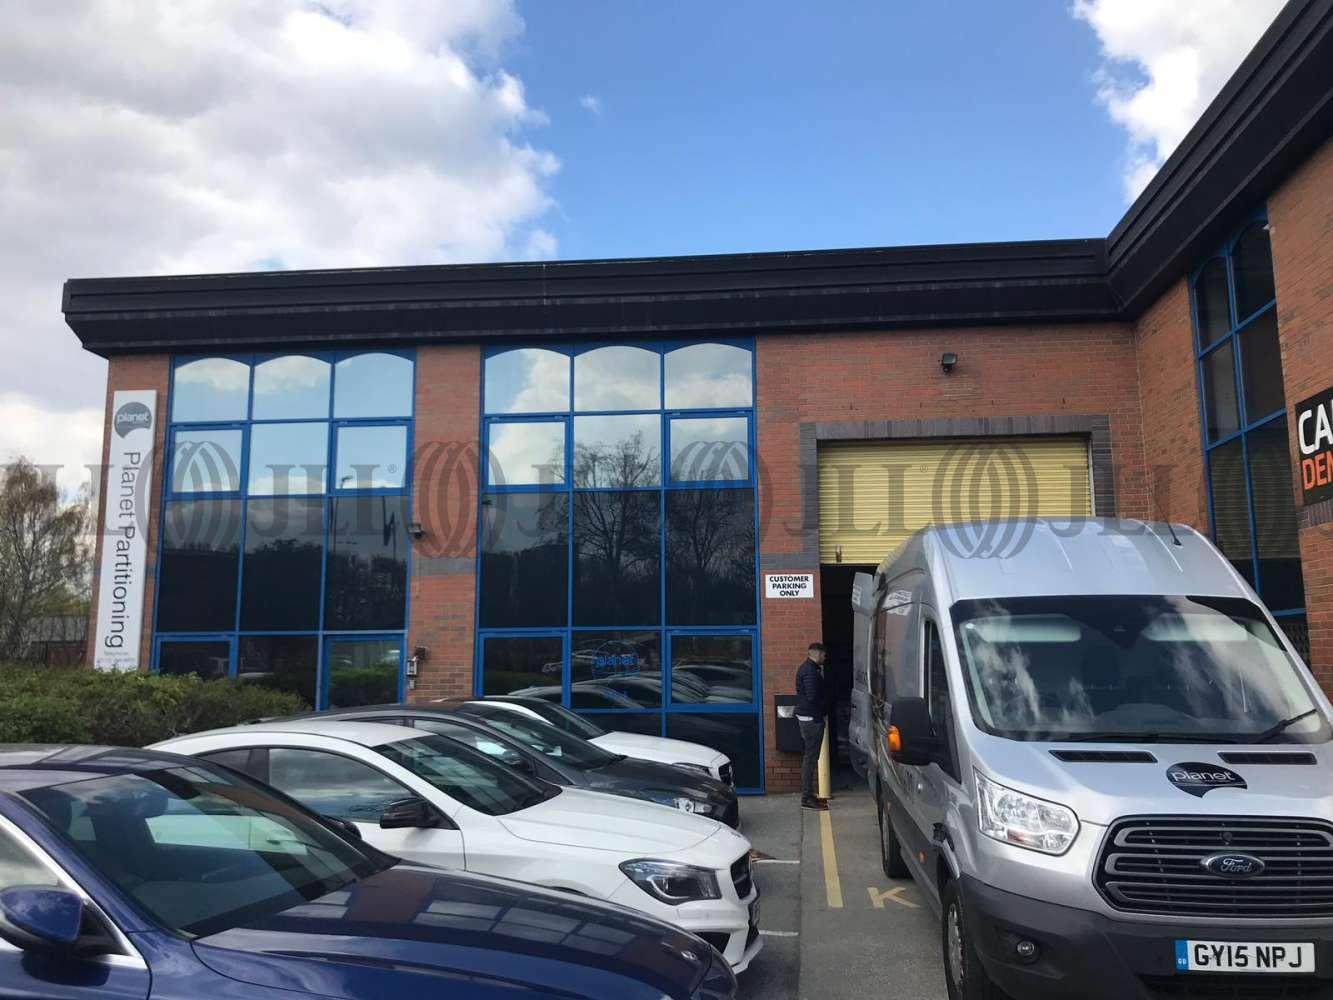 Industrial and logistics Leeds, LS11 5LN - Unit 3 Apex Business Park - 51